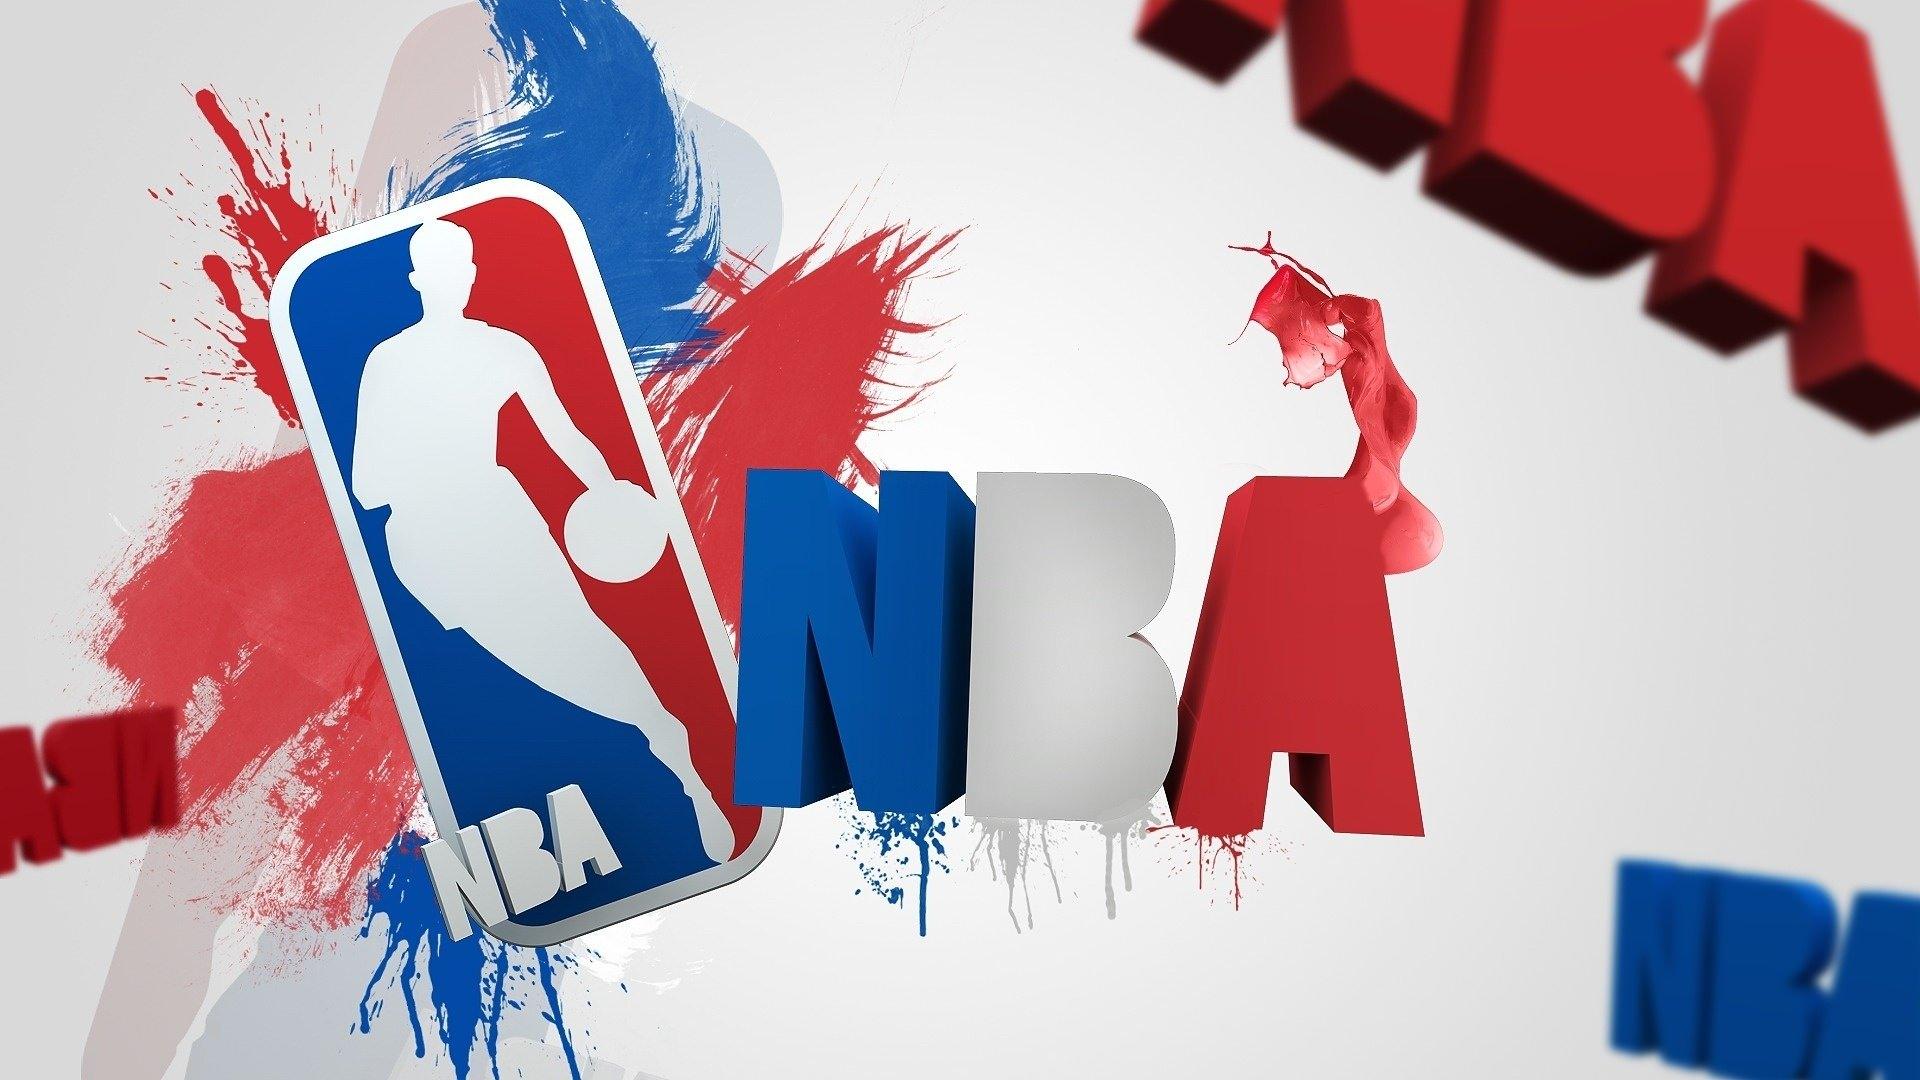 nba basketball background